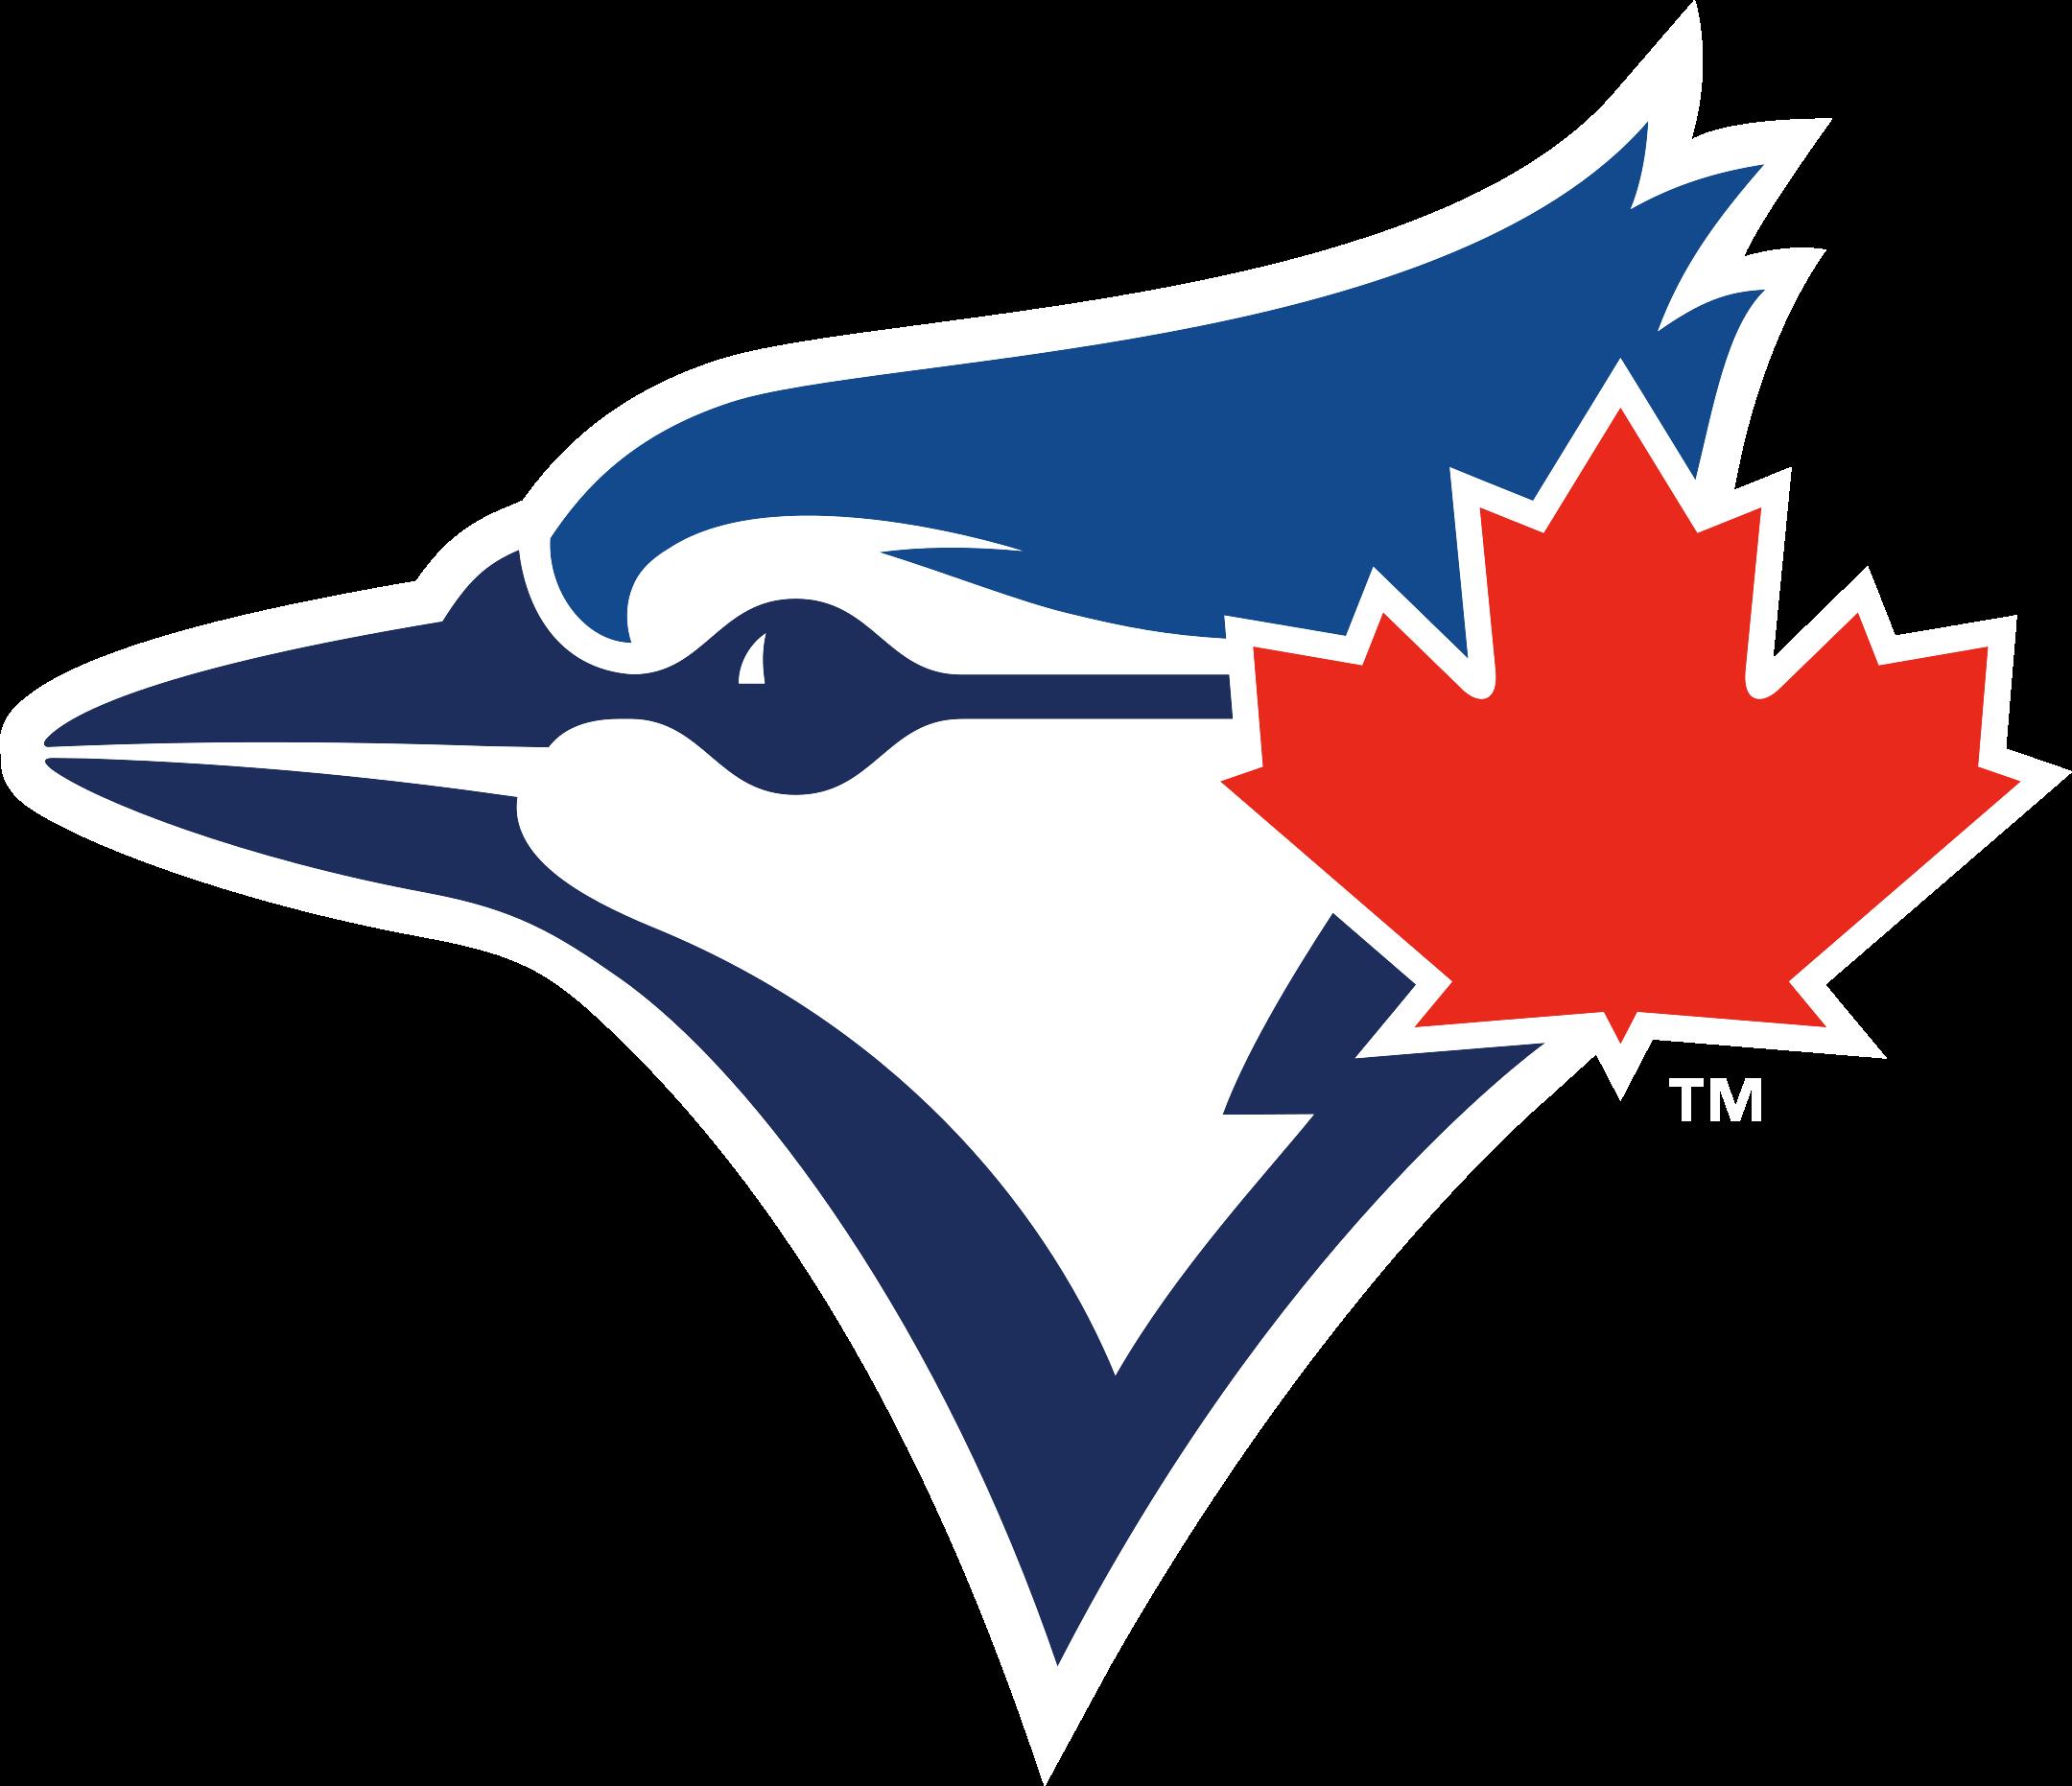 toronto blue jays logo 1 - Toronto Blue Jays Logo